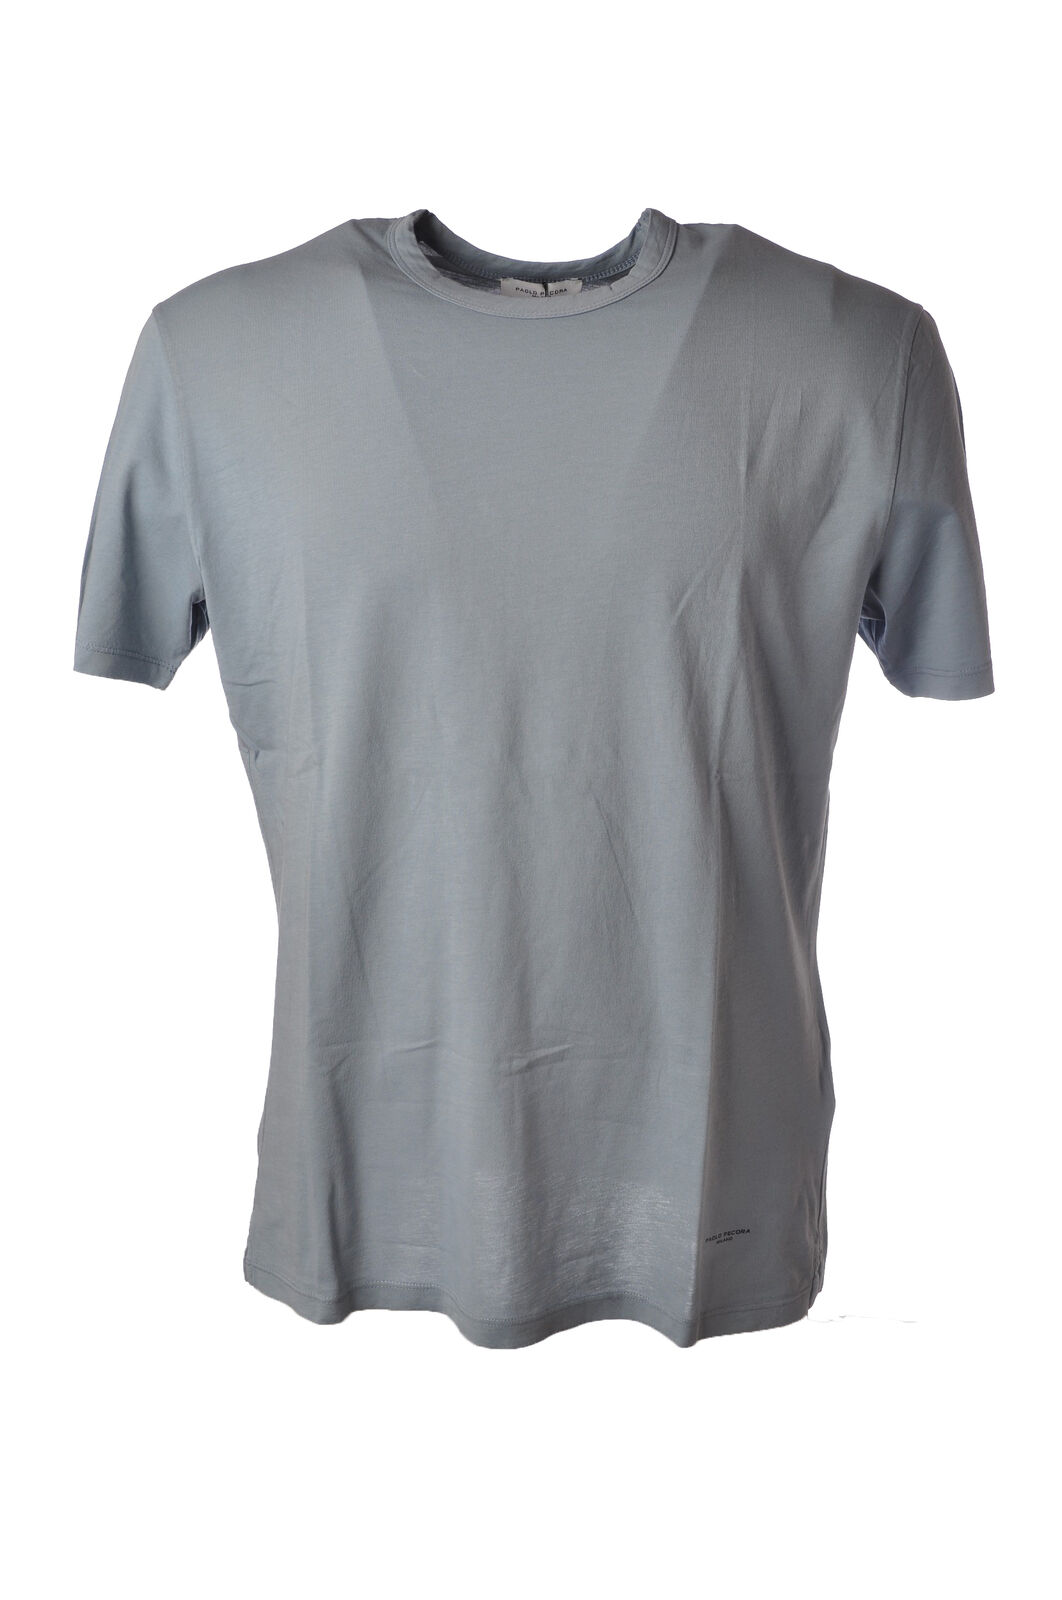 Paolo Pecora - Topwear-T-shirts - Uomo - Grigio - 5039925I185156